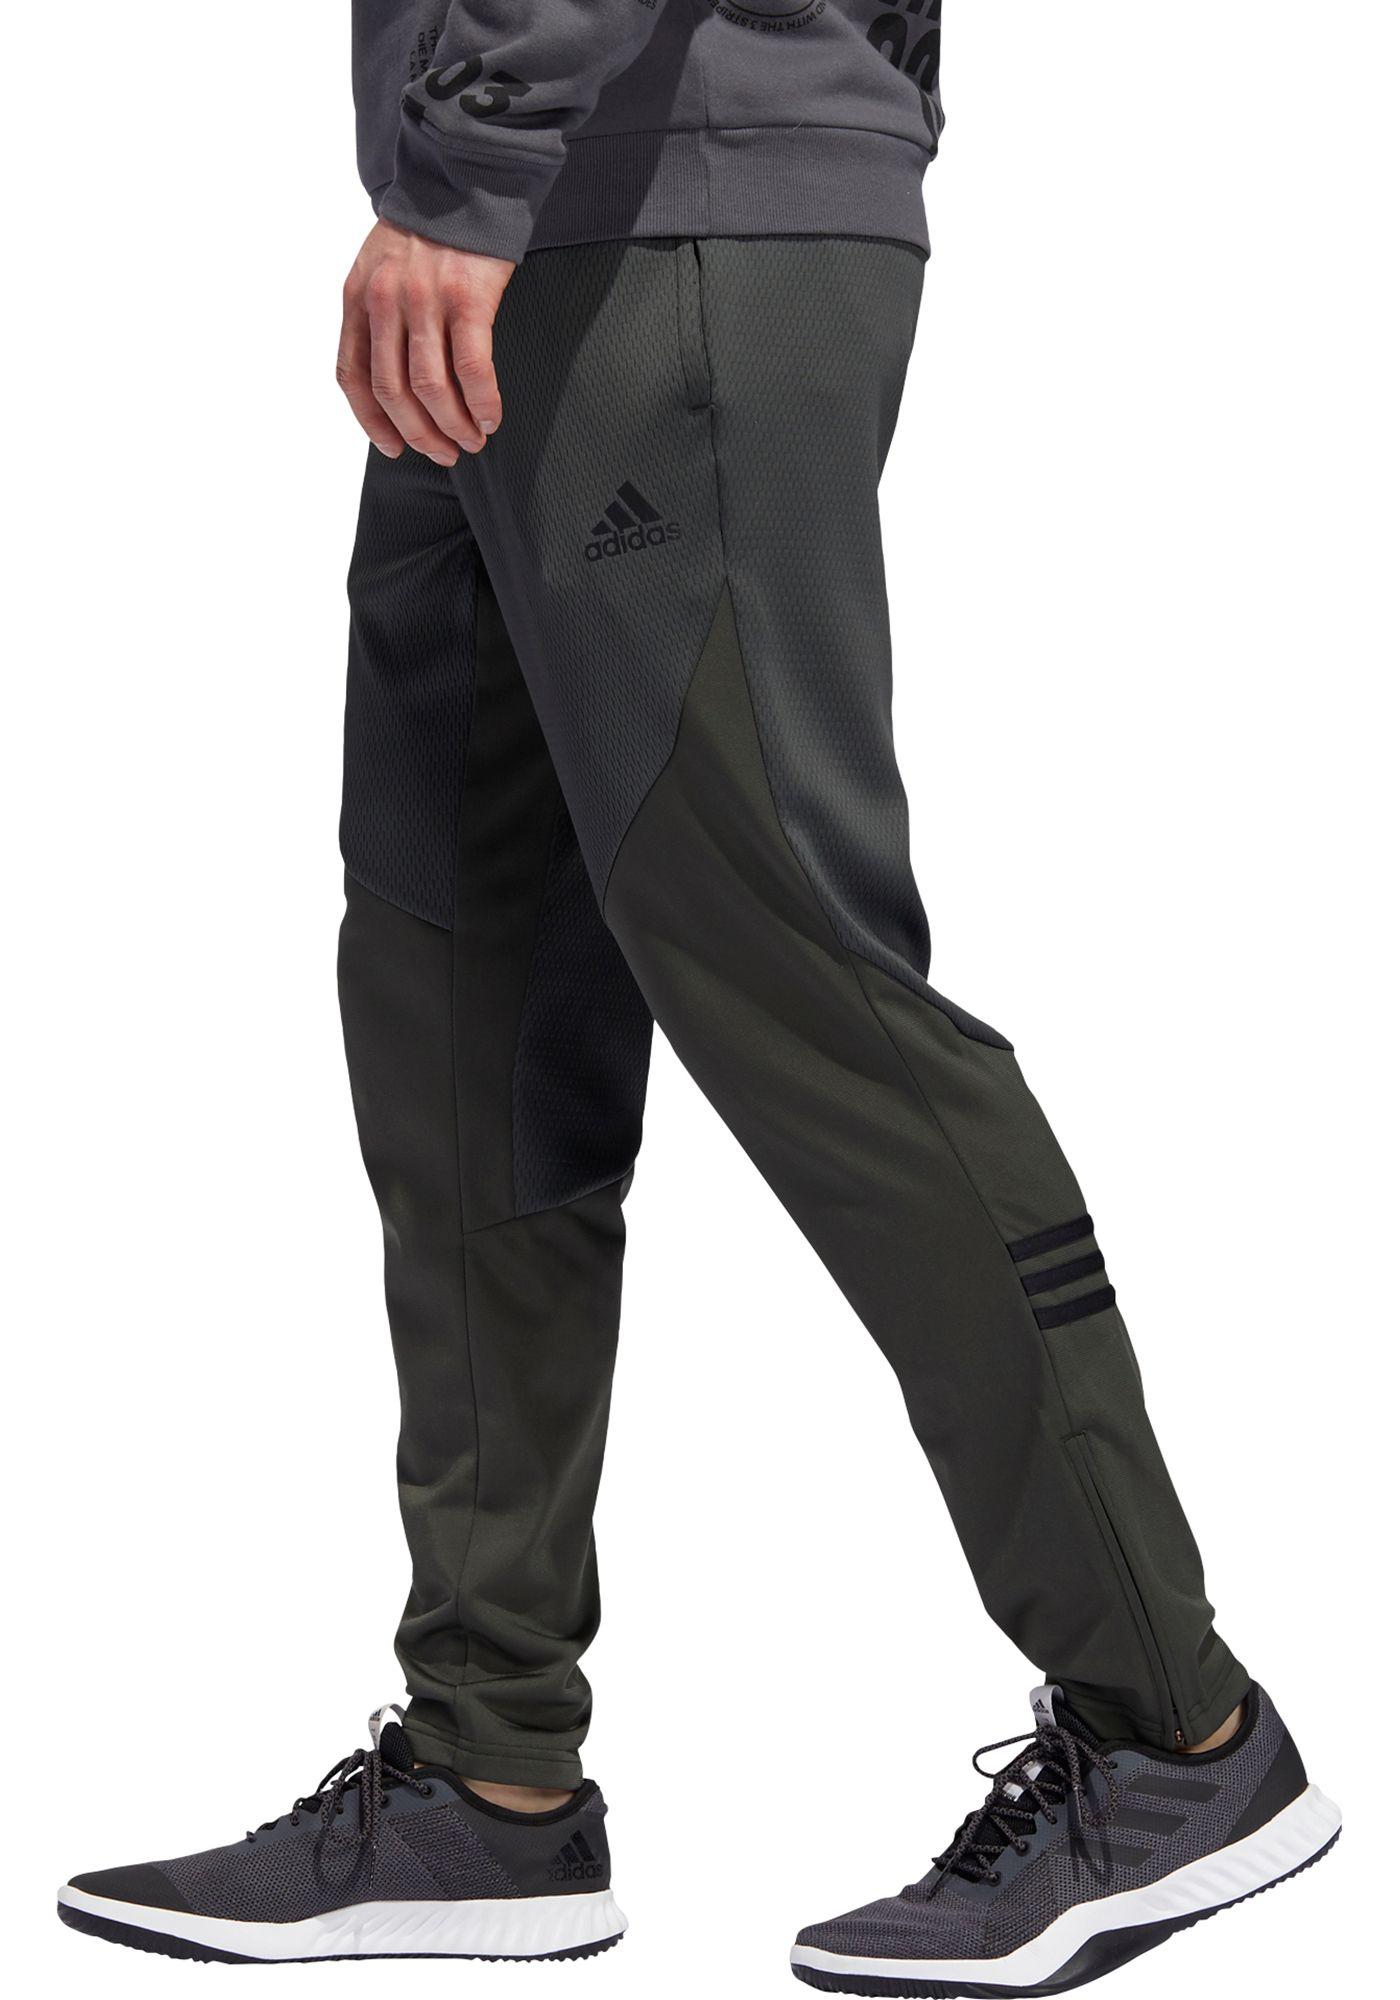 adidas Men's Axis Tech Pants